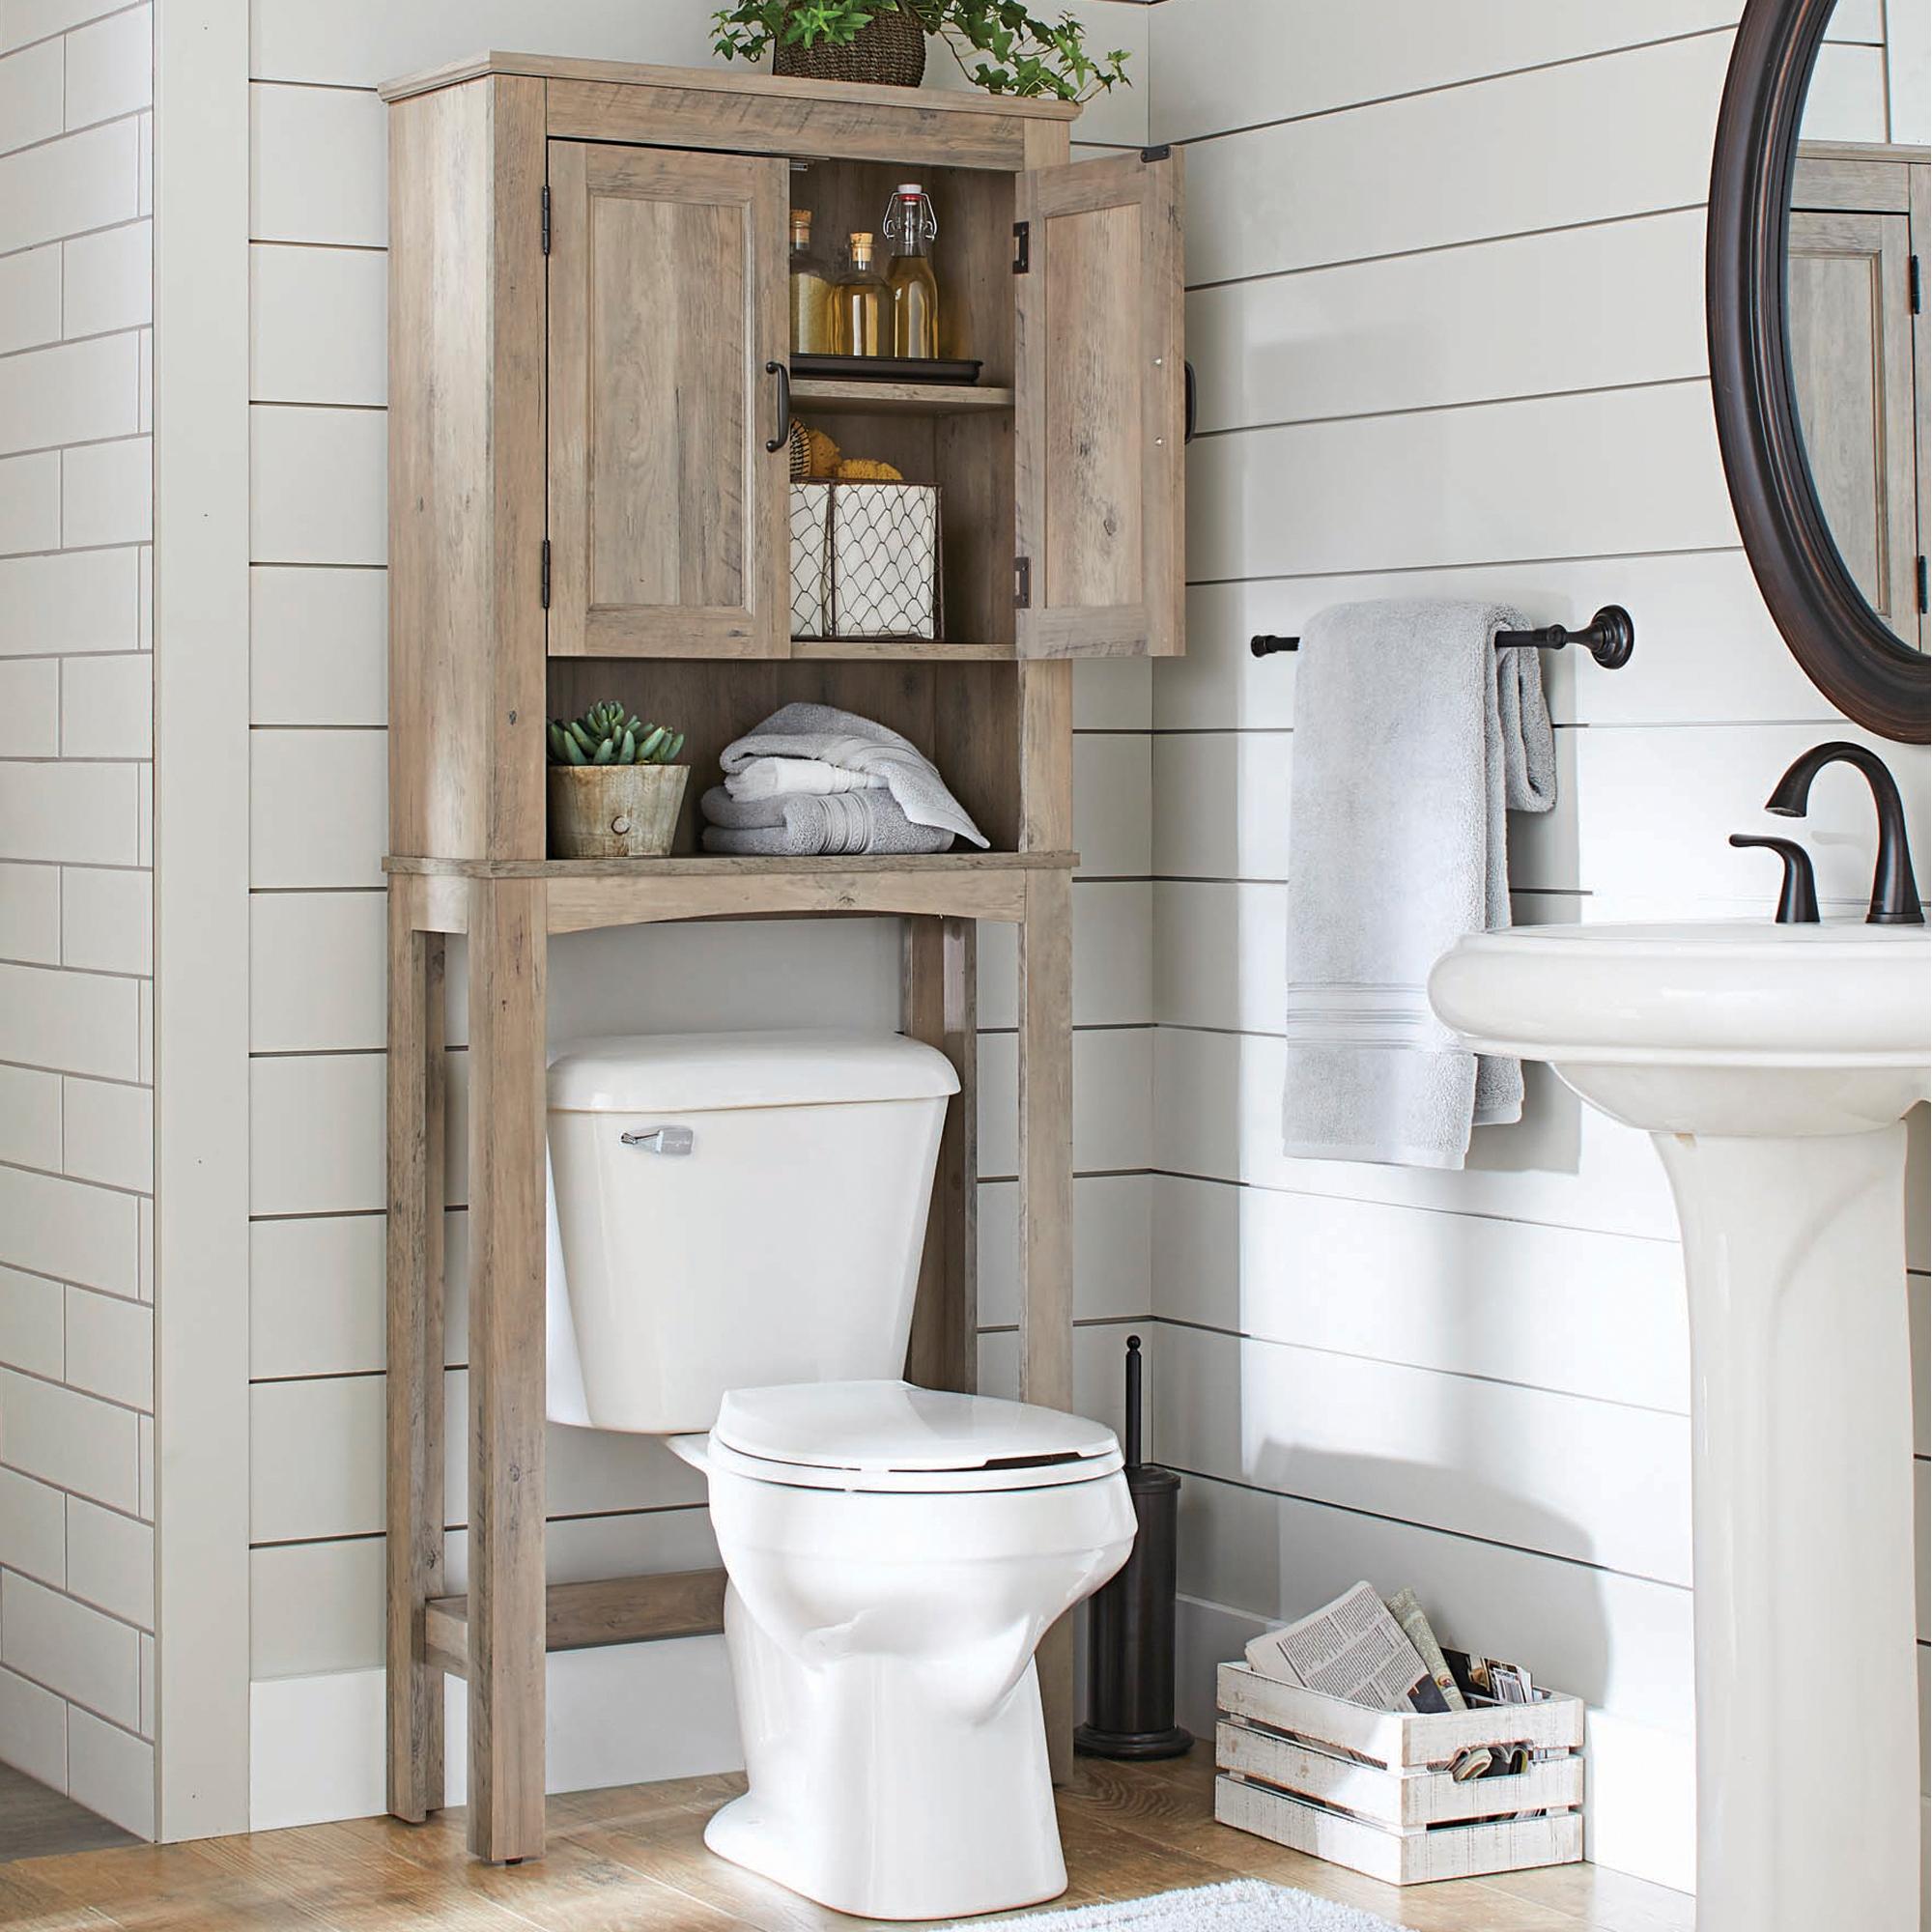 Better Homes & Gardens Bathroom Space Saver